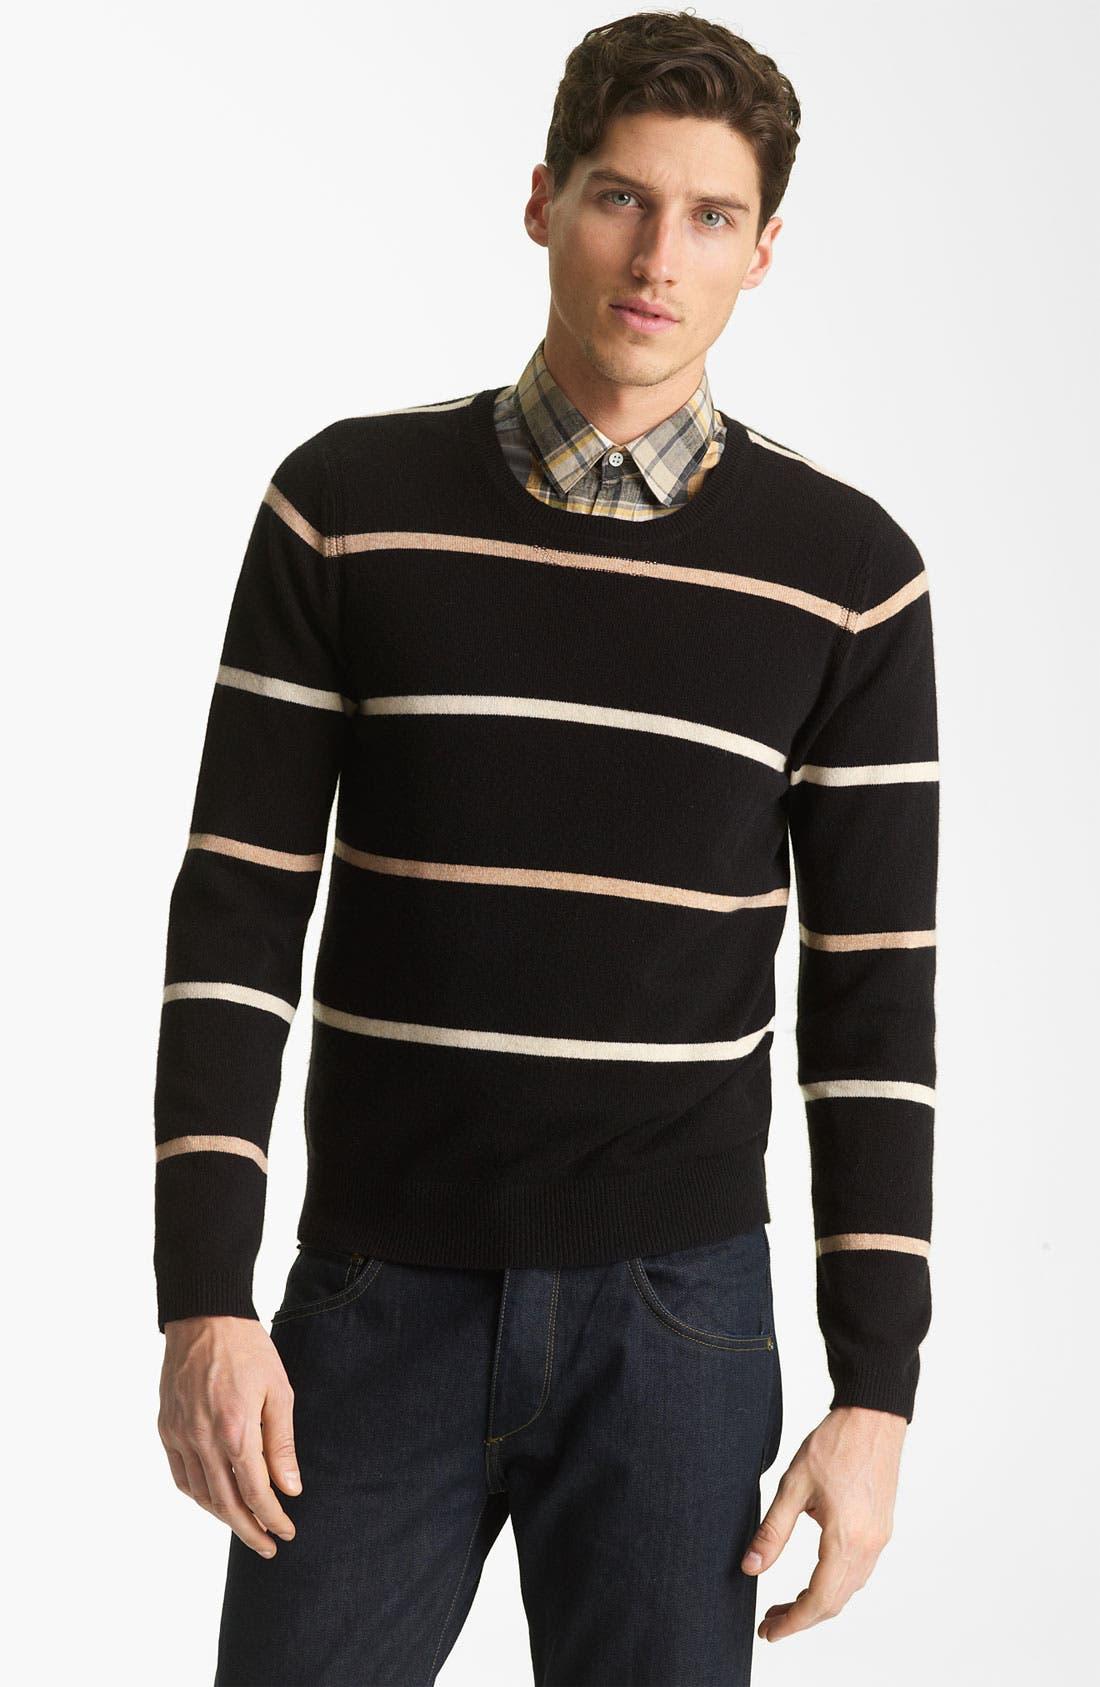 Alternate Image 1 Selected - Shipley & Halmos 'Laurel' Cashmere Sweater